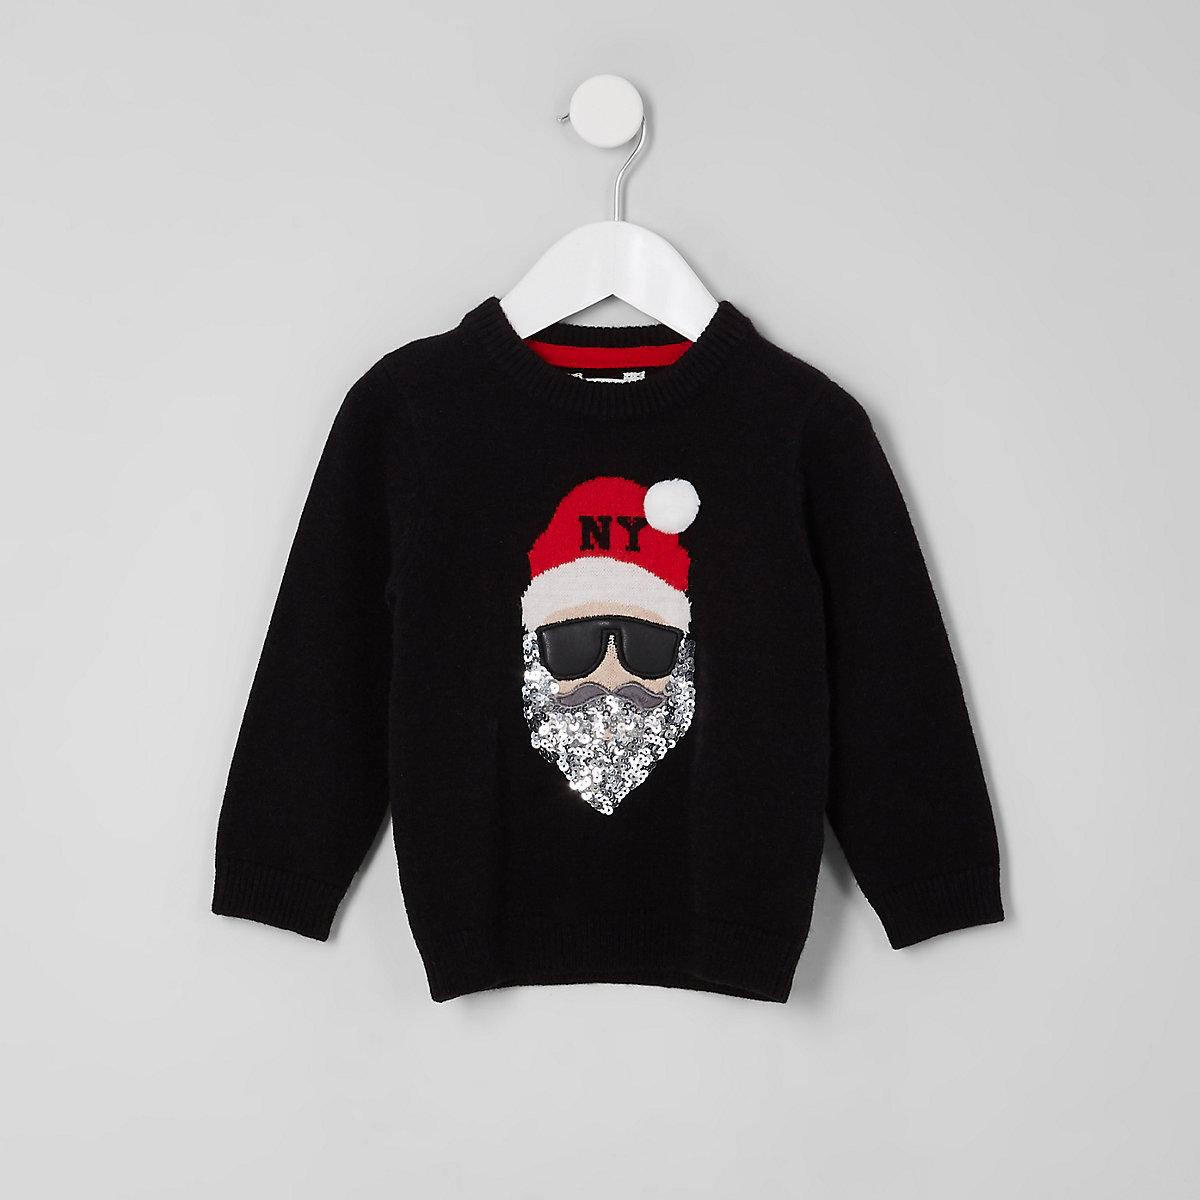 Mini Kids Black Santa Claus Christmas Sweater Baby Boys Tops